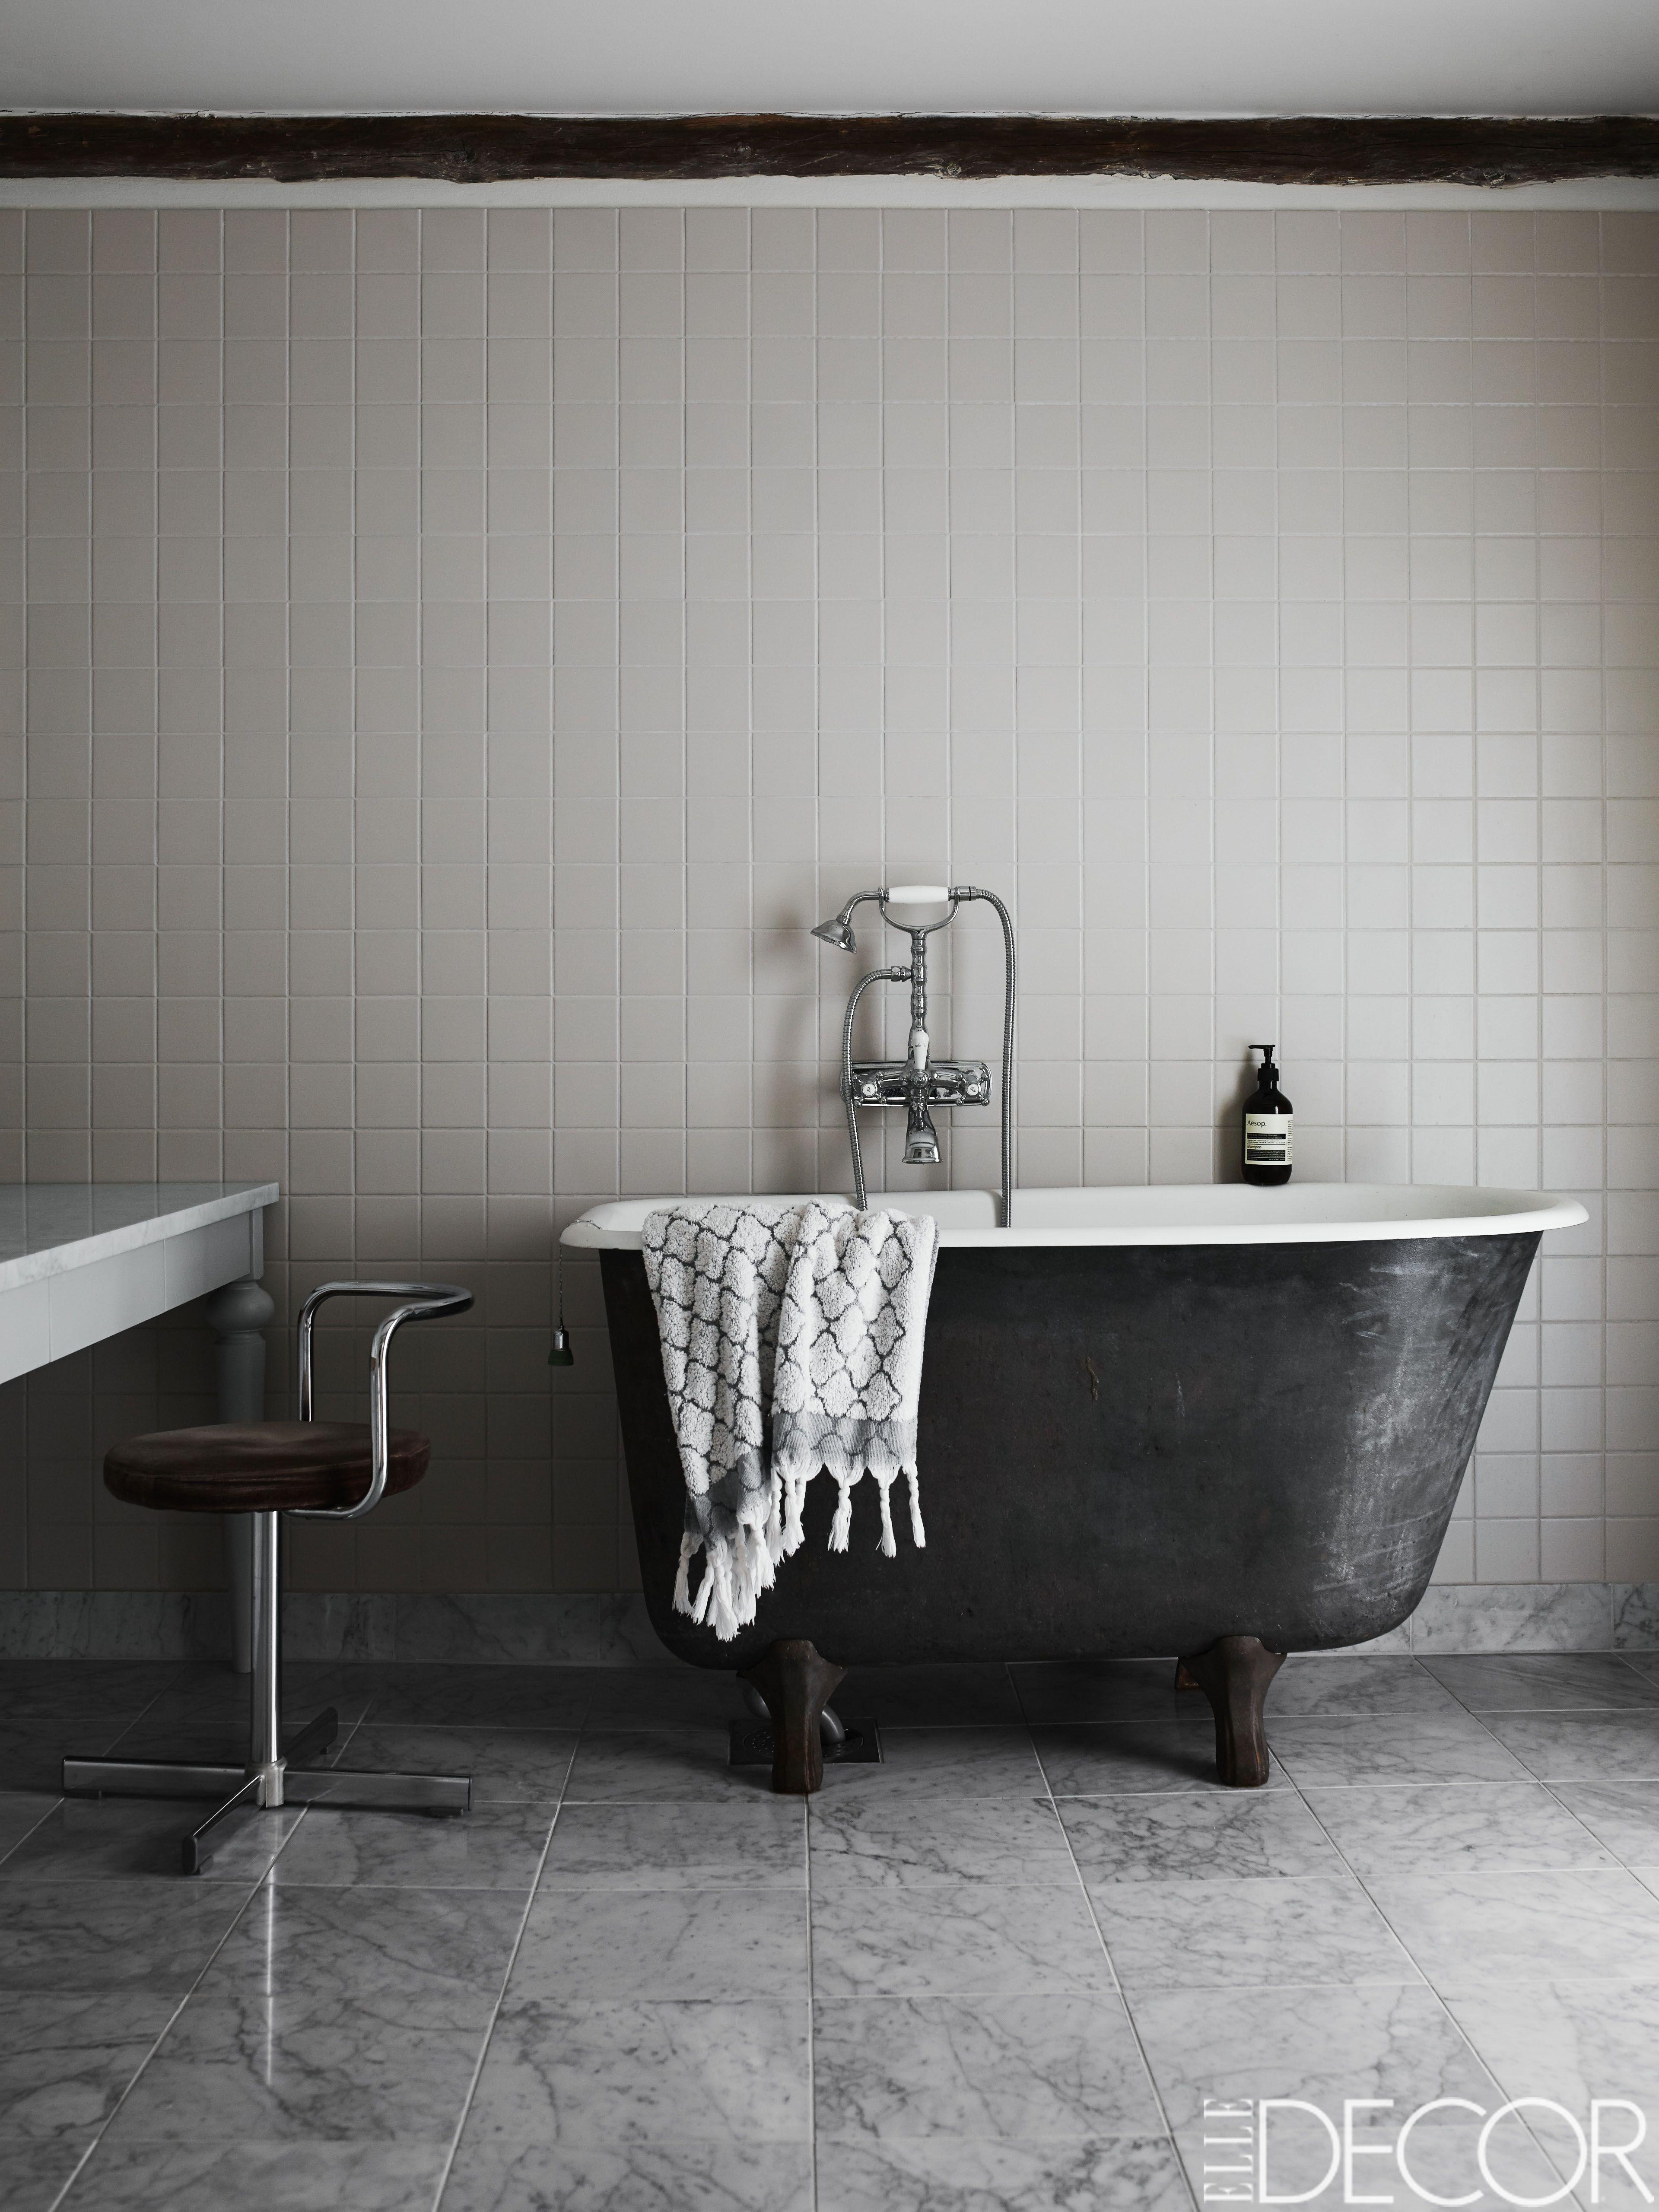 traditional black bathroom. A Vintage Tub With Fittings By Mora Armatur In Bathroom; The Floor Is Tiled Carrara Marble. - ELLEDecor.com Traditional Black Bathroom I